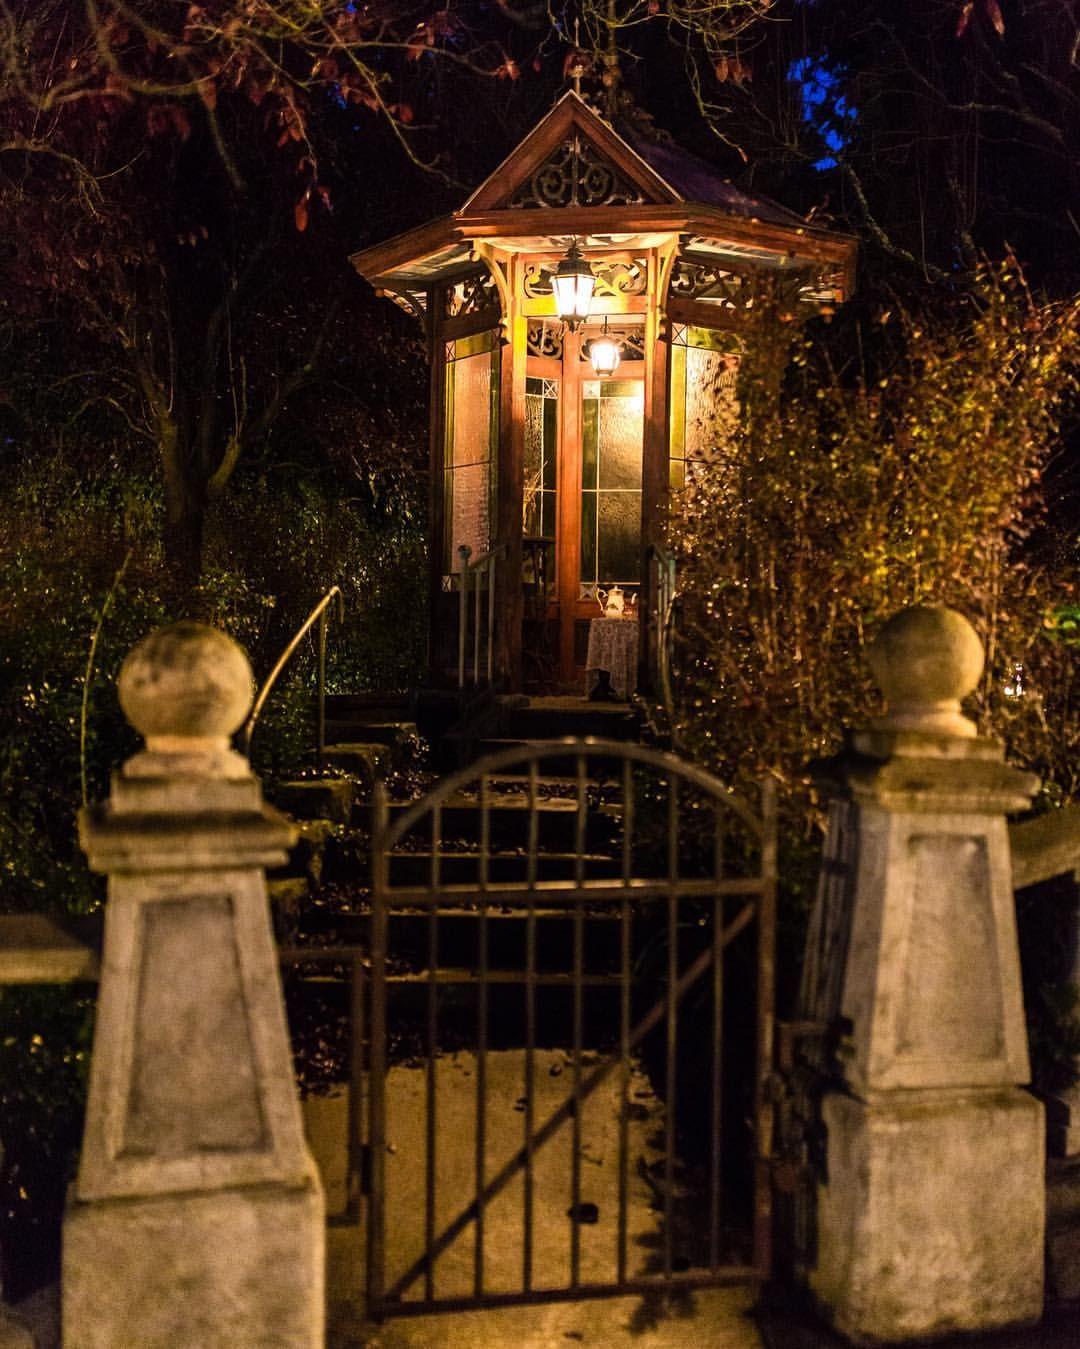 Phantom Manor Frontyard #disneylandparis #dlp #dlrp